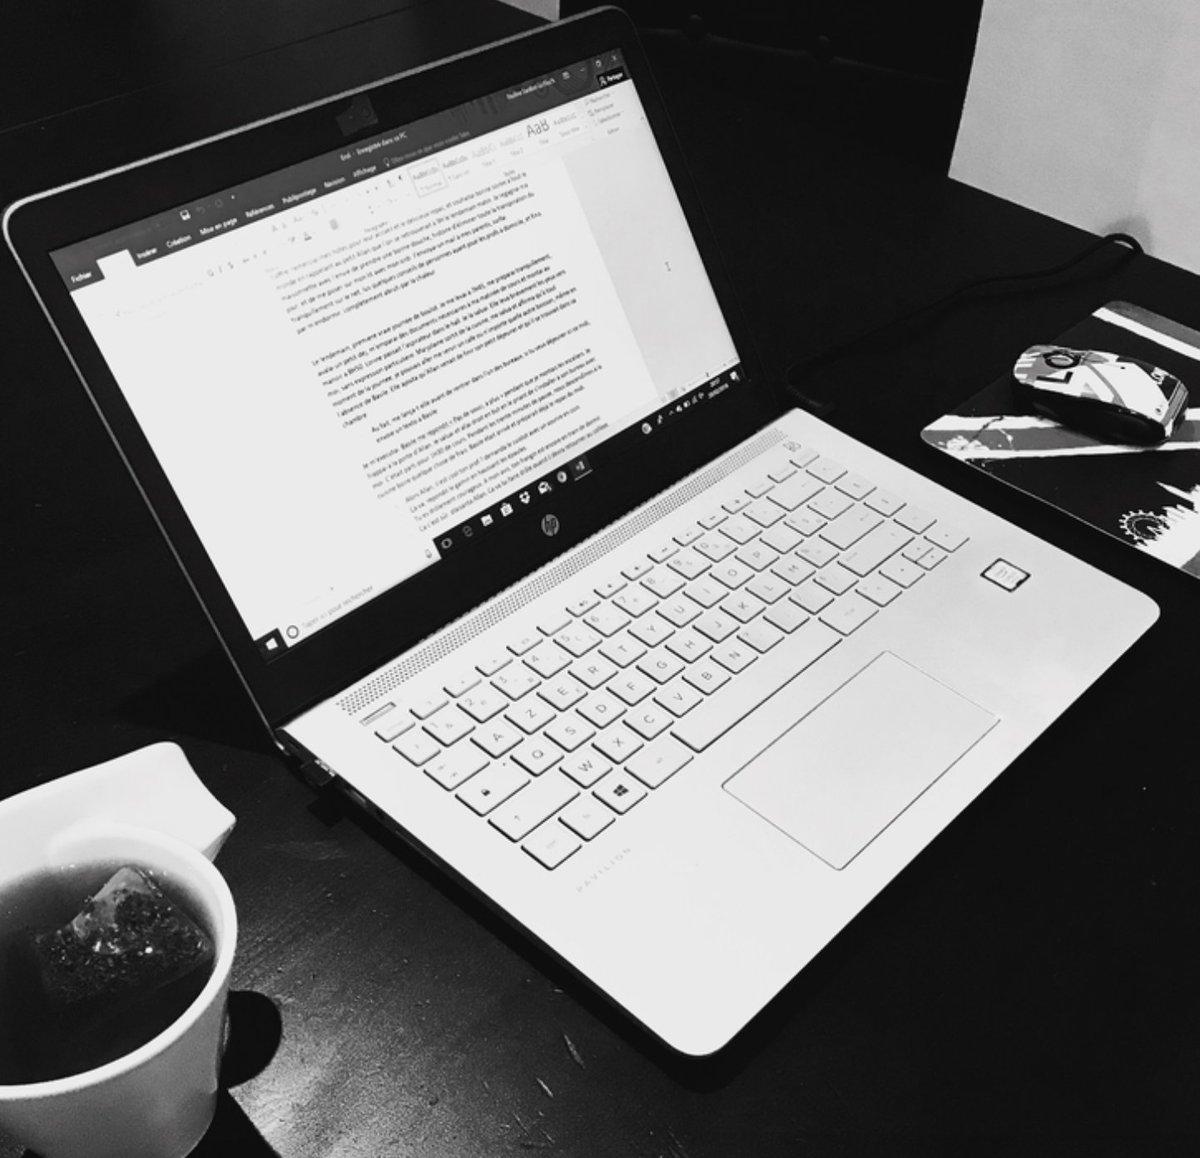 Who wants to do some writing just for fun? https://t.co/U7PaxRJLGV https://t.co/PFhoYbUnkZ